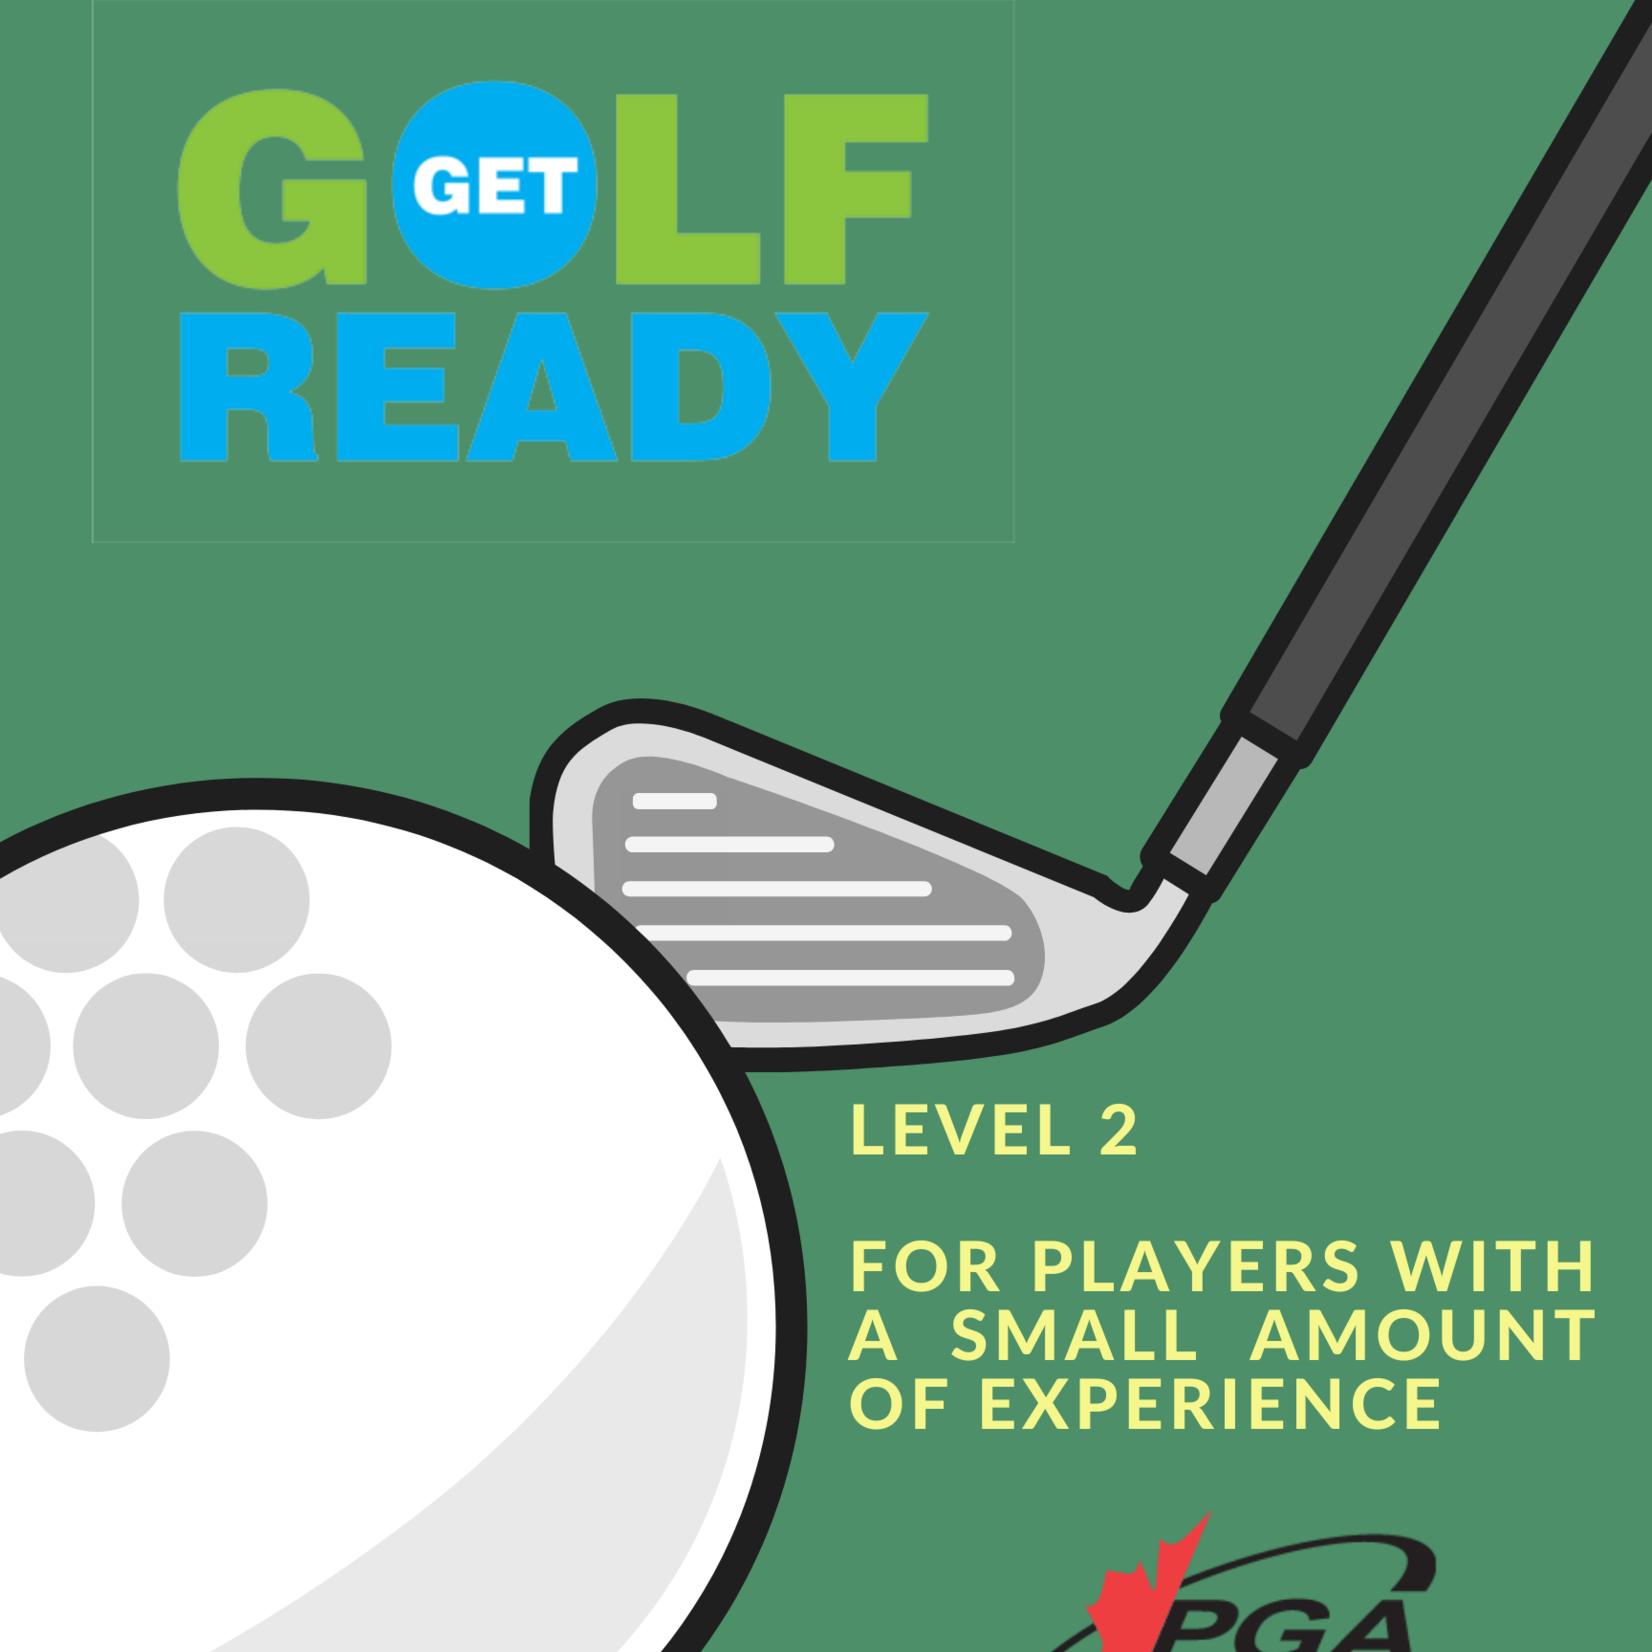 2021 Get Golf Ready Level 2 Wed/Fri April 14,16,21,23 7:00-8:00pm